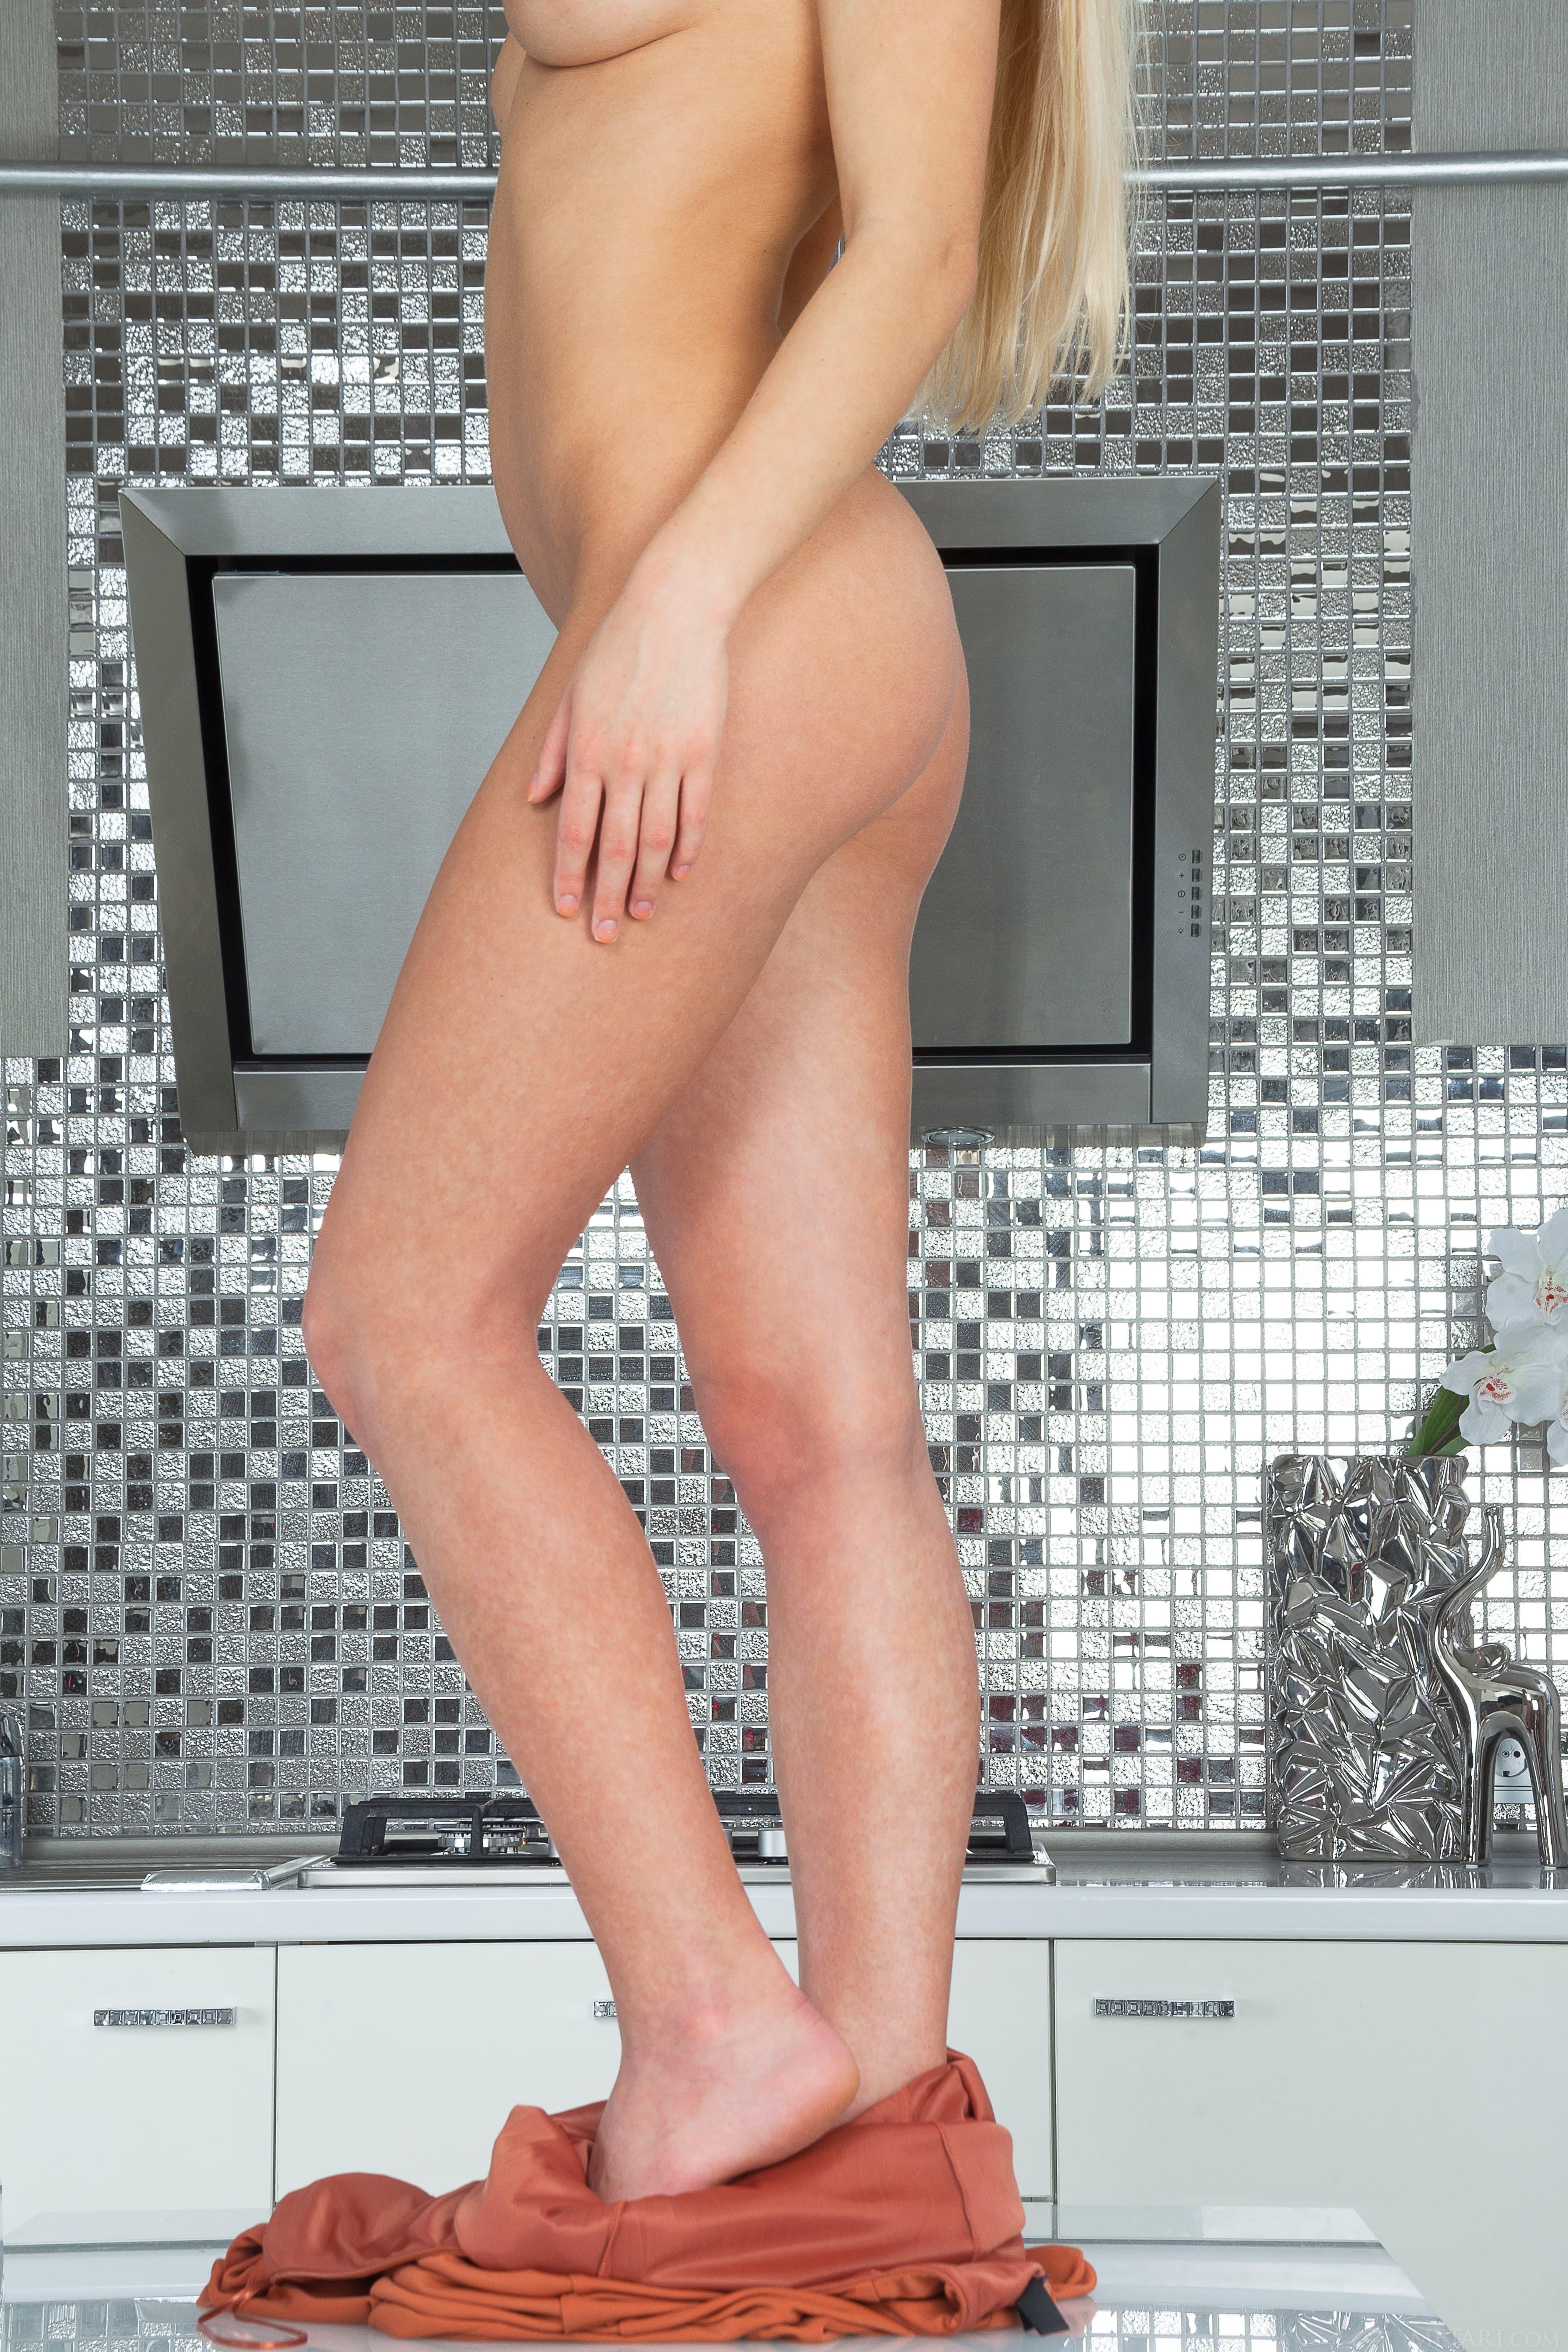 Голая блондинка забралась на кухонный стол - фото